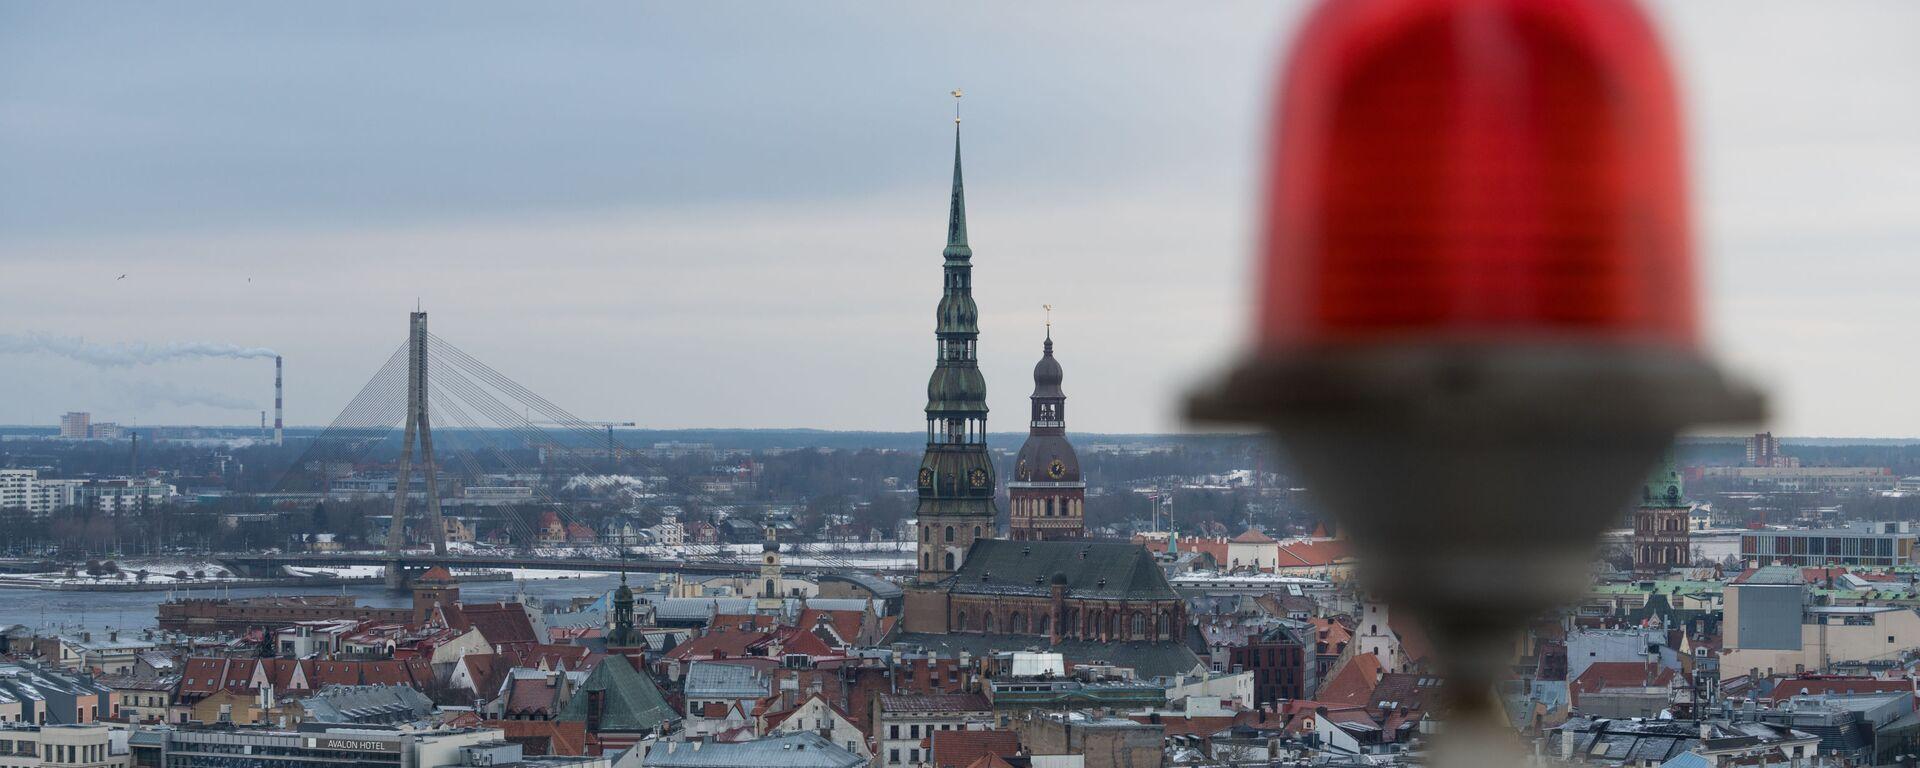 Riga, Lotyšsko - Sputnik Česká republika, 1920, 19.06.2021